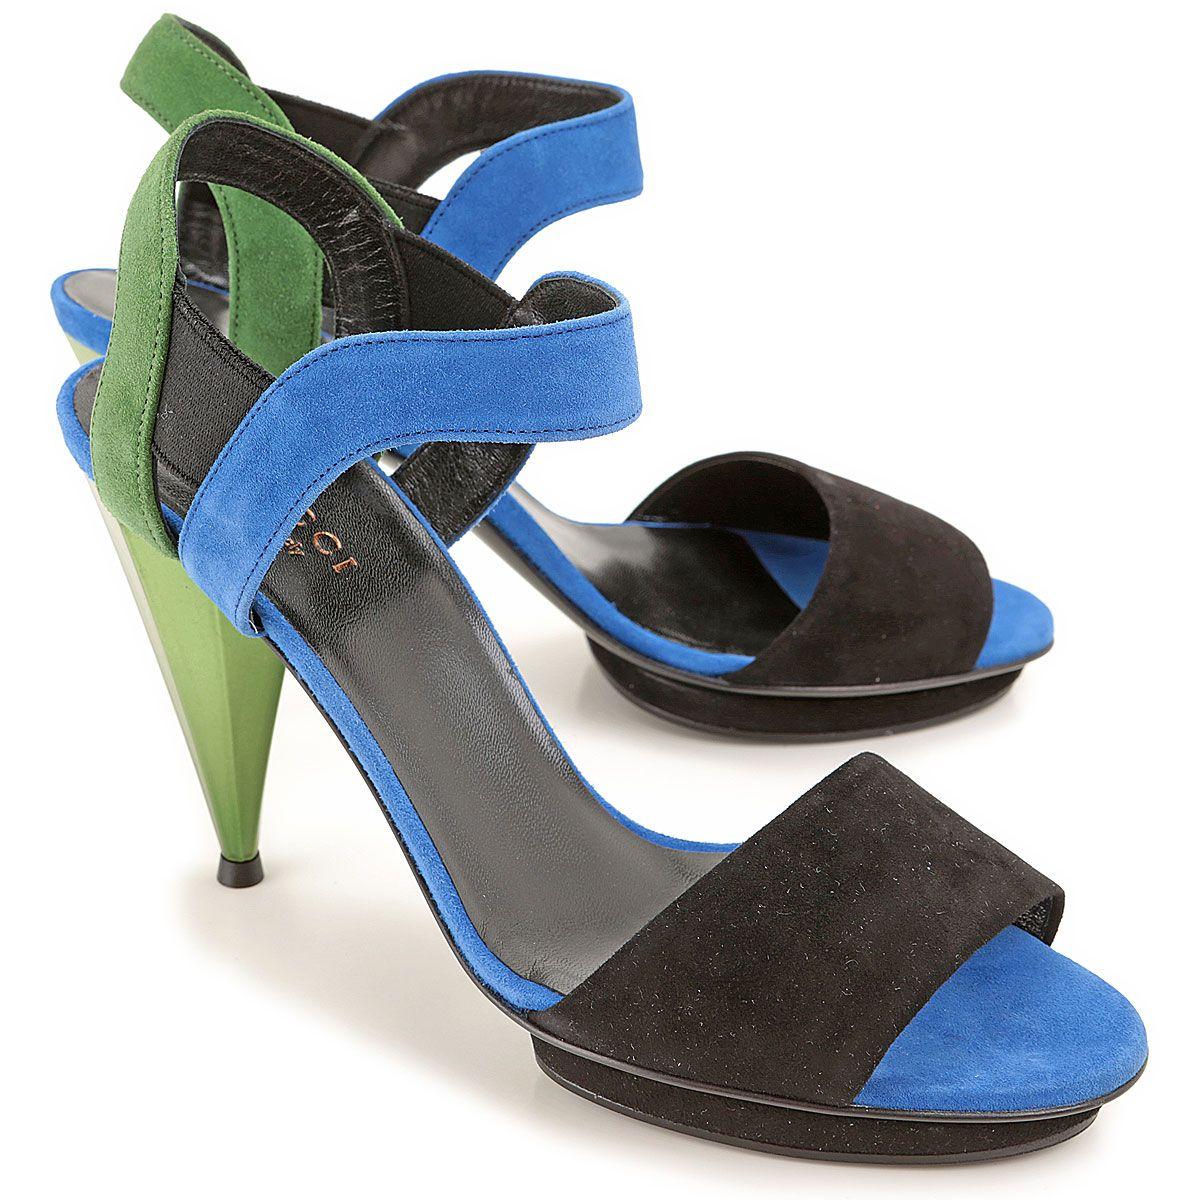 Gucci   http://www.raffaello-network.com/english/fashion-product-list/81/Gucci-Womens-Shoes.html